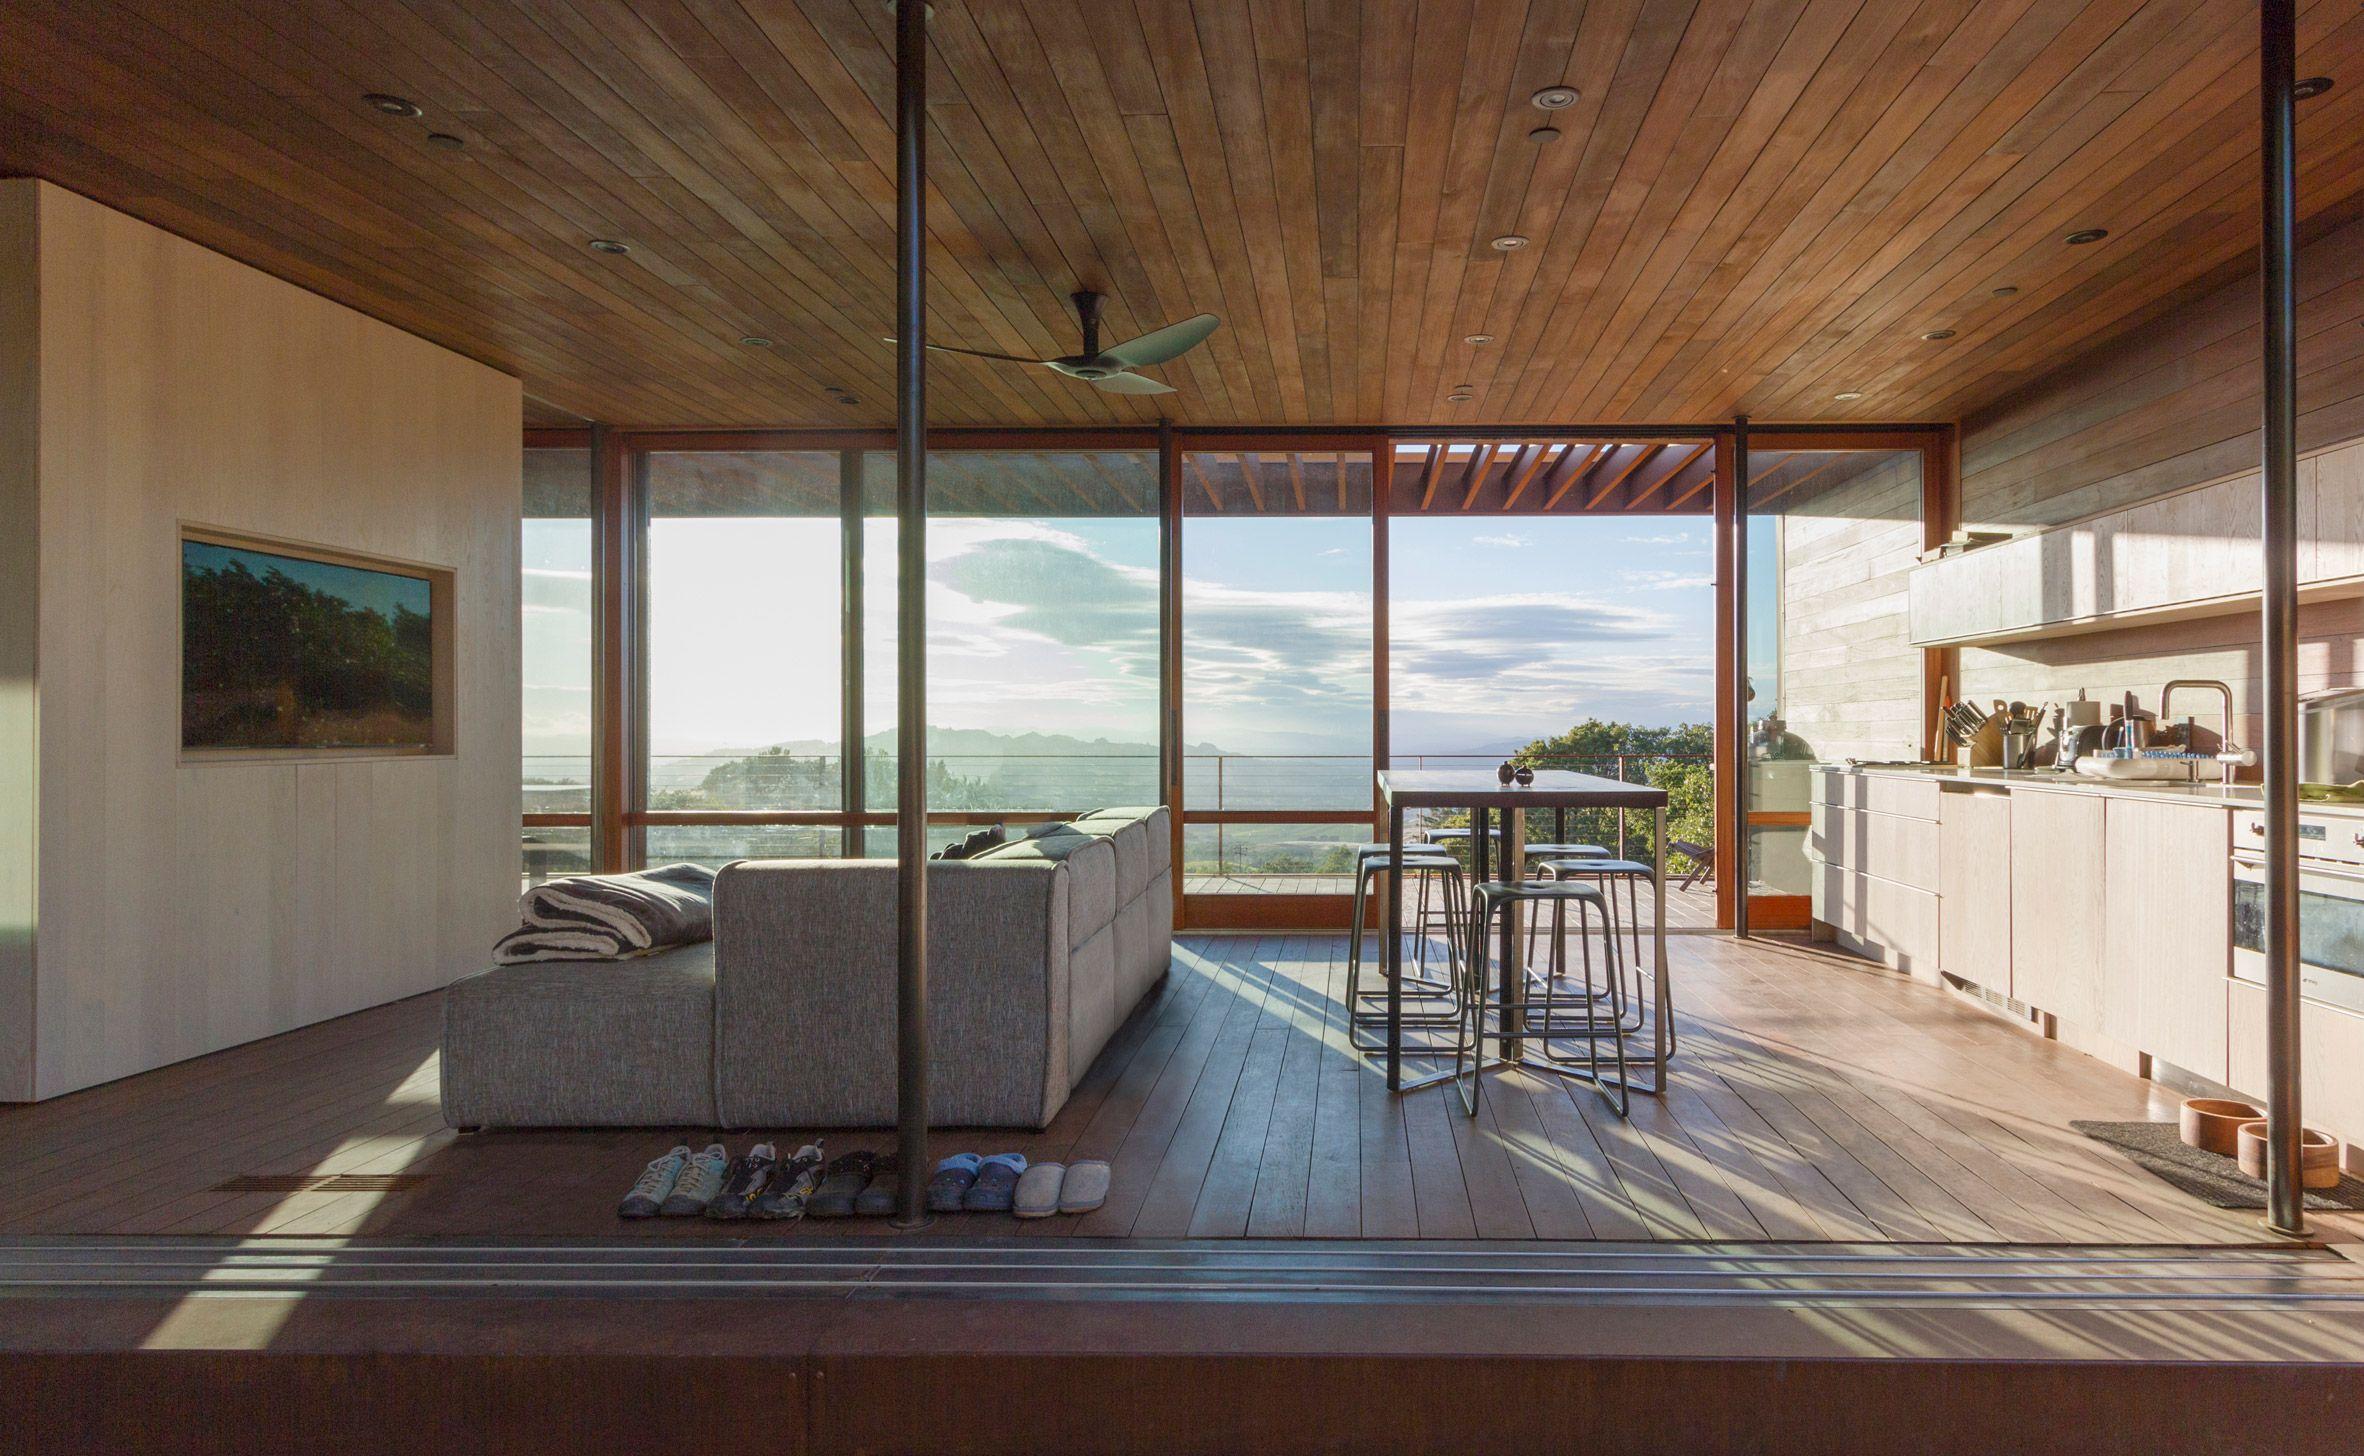 sonoma weehouse by alchemy architects interior design prefab rh pinterest com